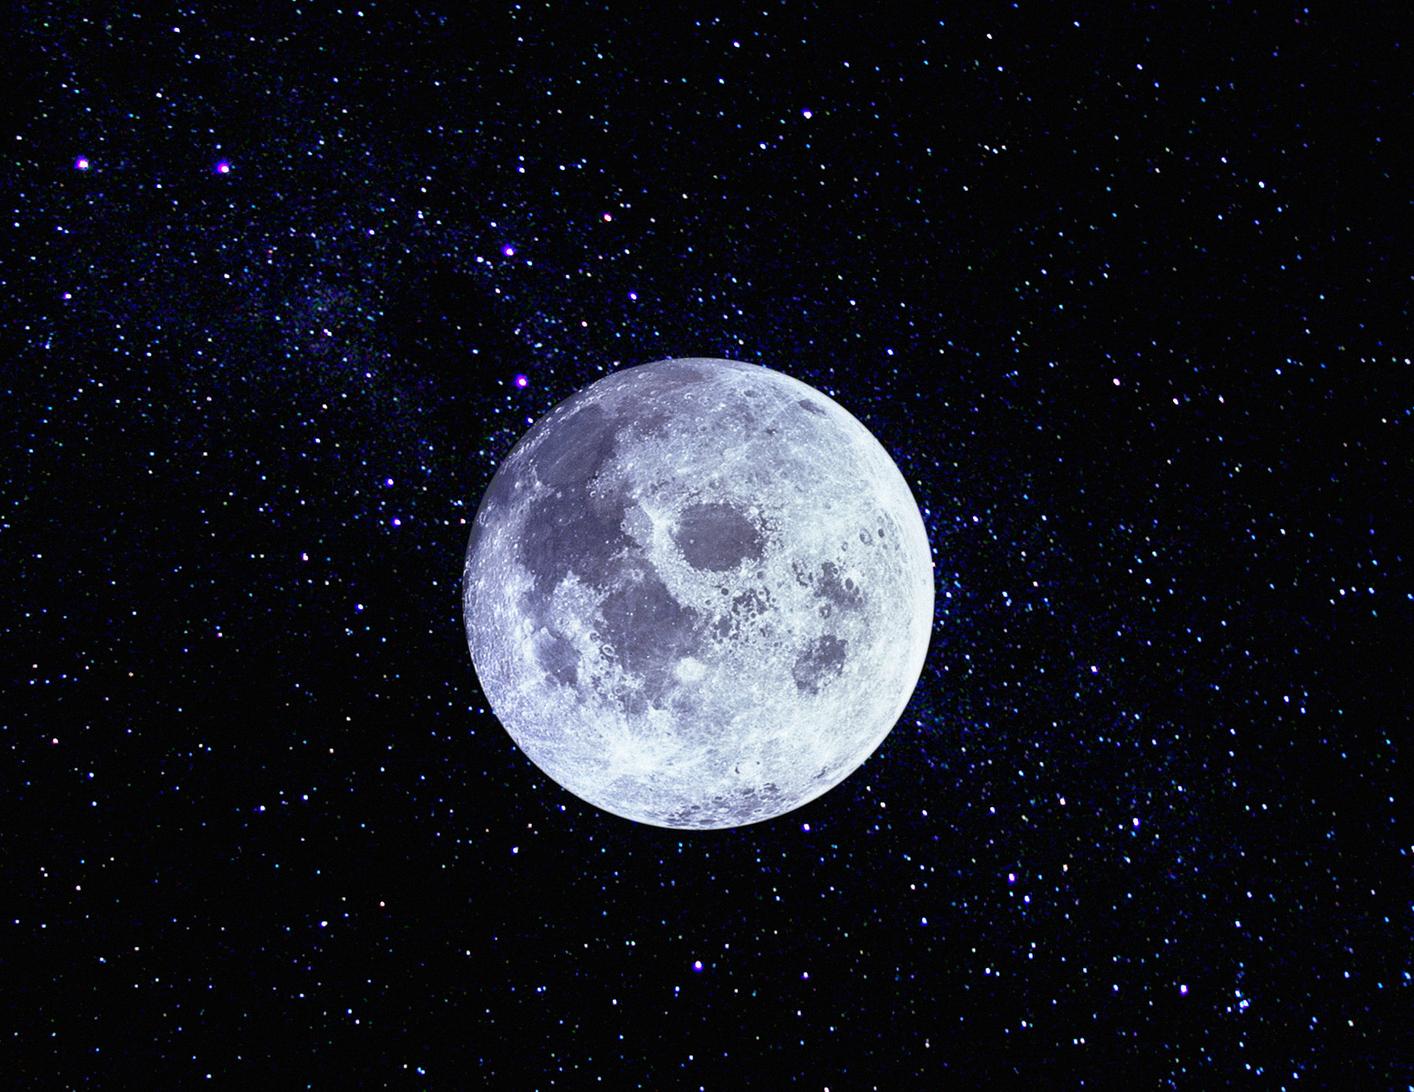 Full moon reflecting on ocean at night